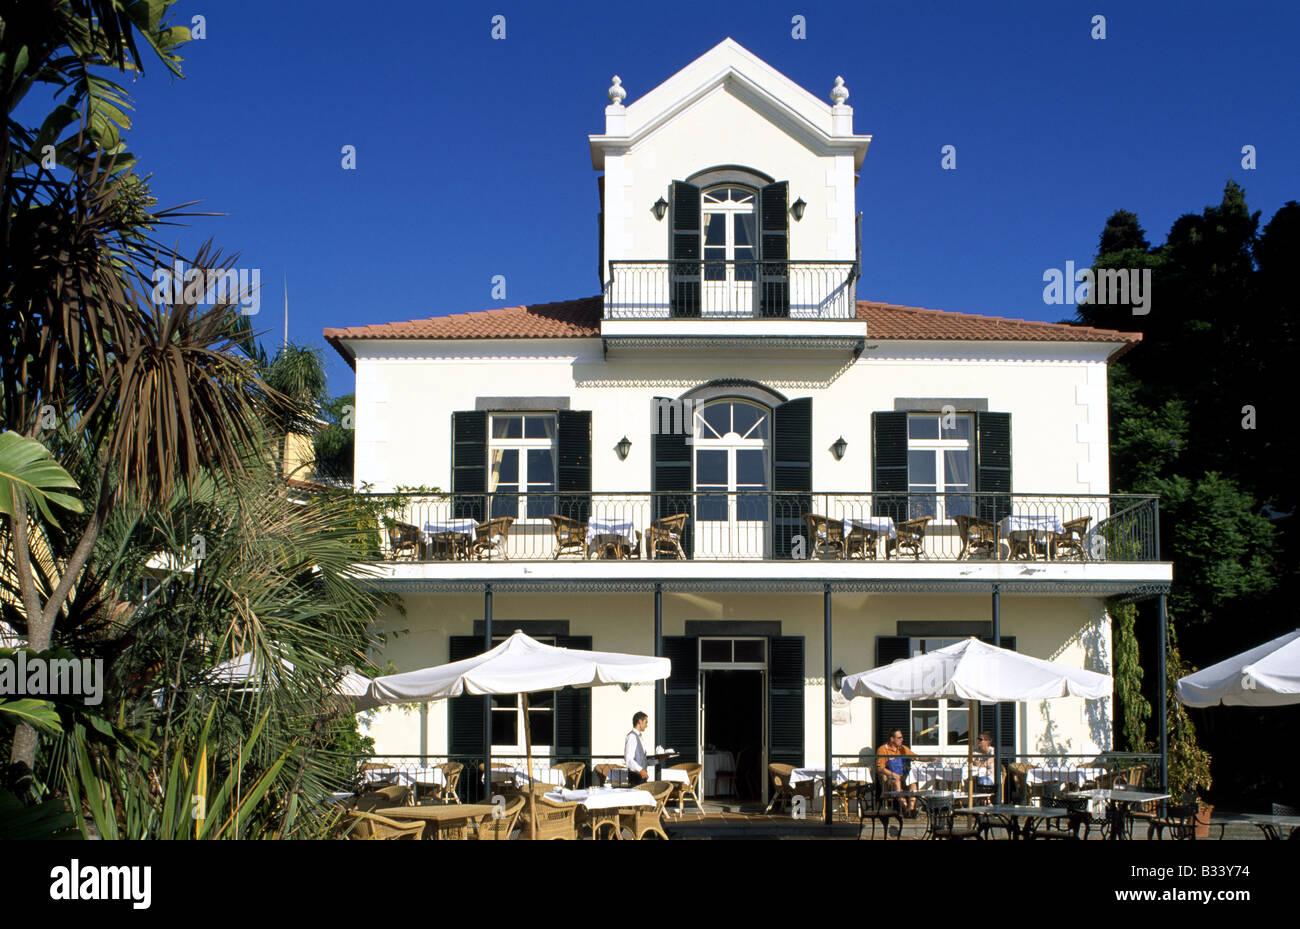 Hotel Quinta do Estreito nearby Camara de Lobos on Madeira Island Stock Photo